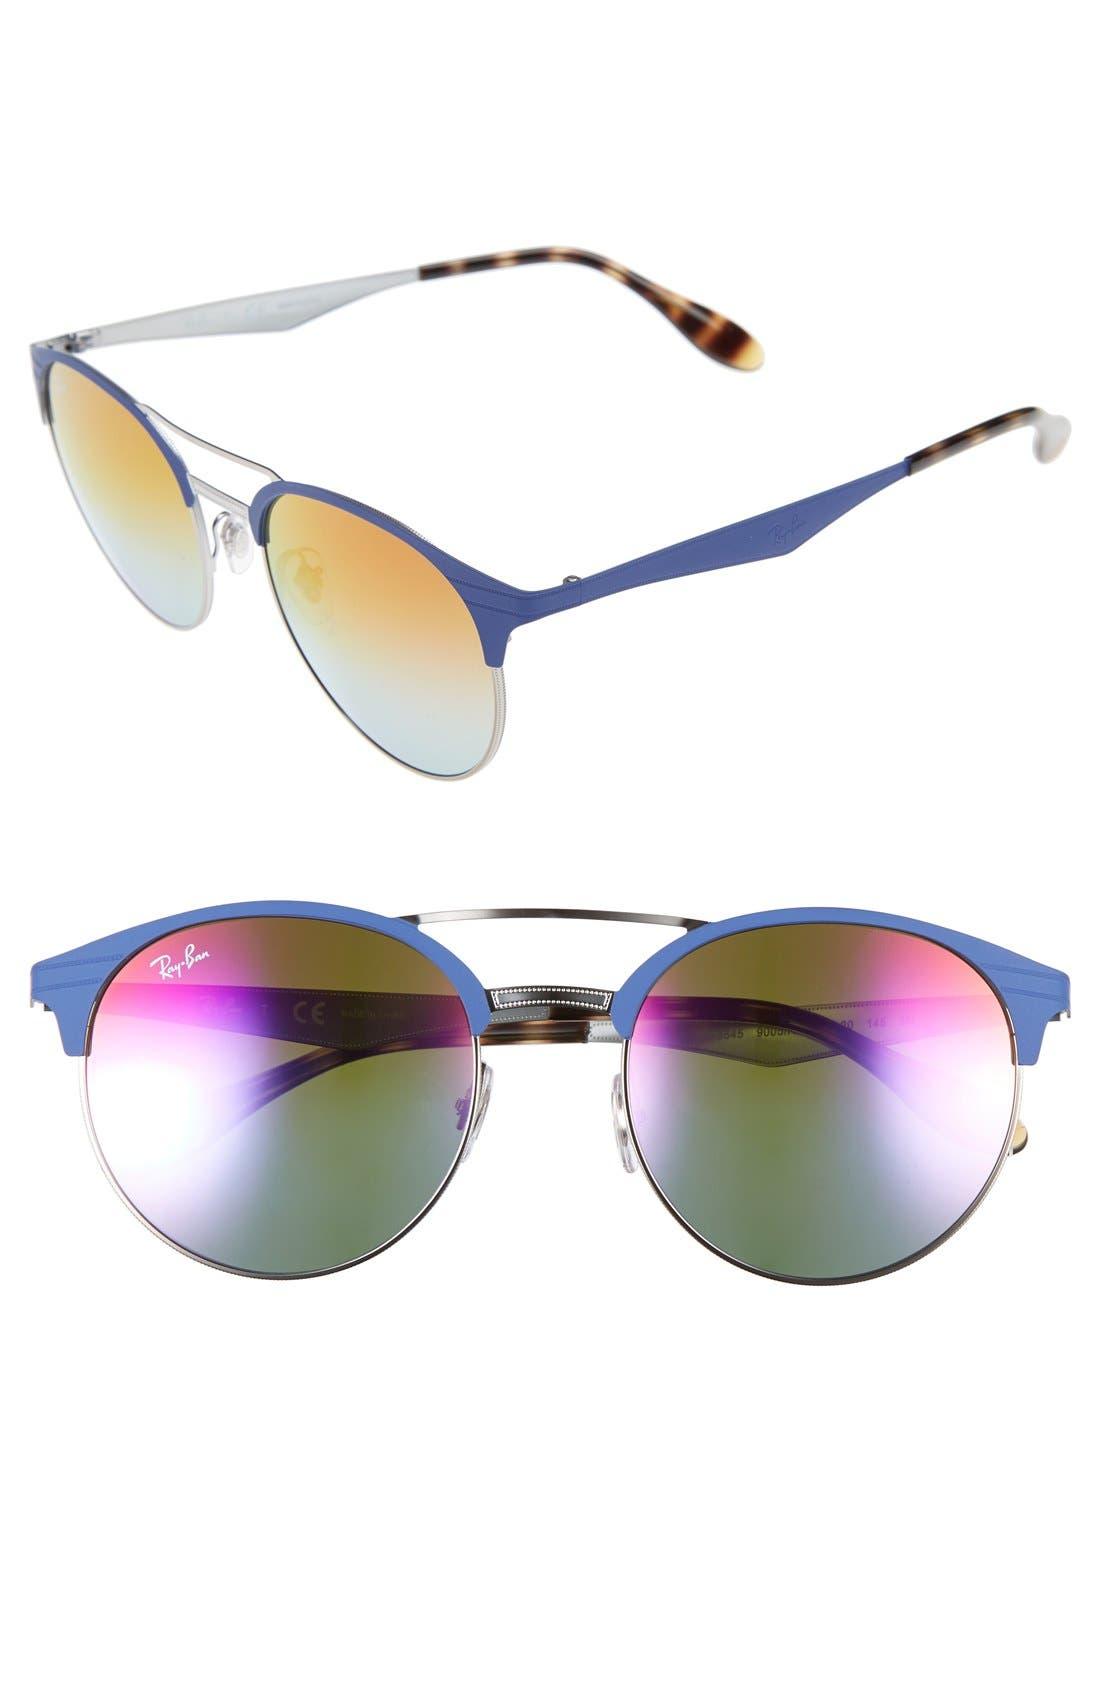 Highstreet 54mm Round Sunglasses,                             Main thumbnail 1, color,                             001